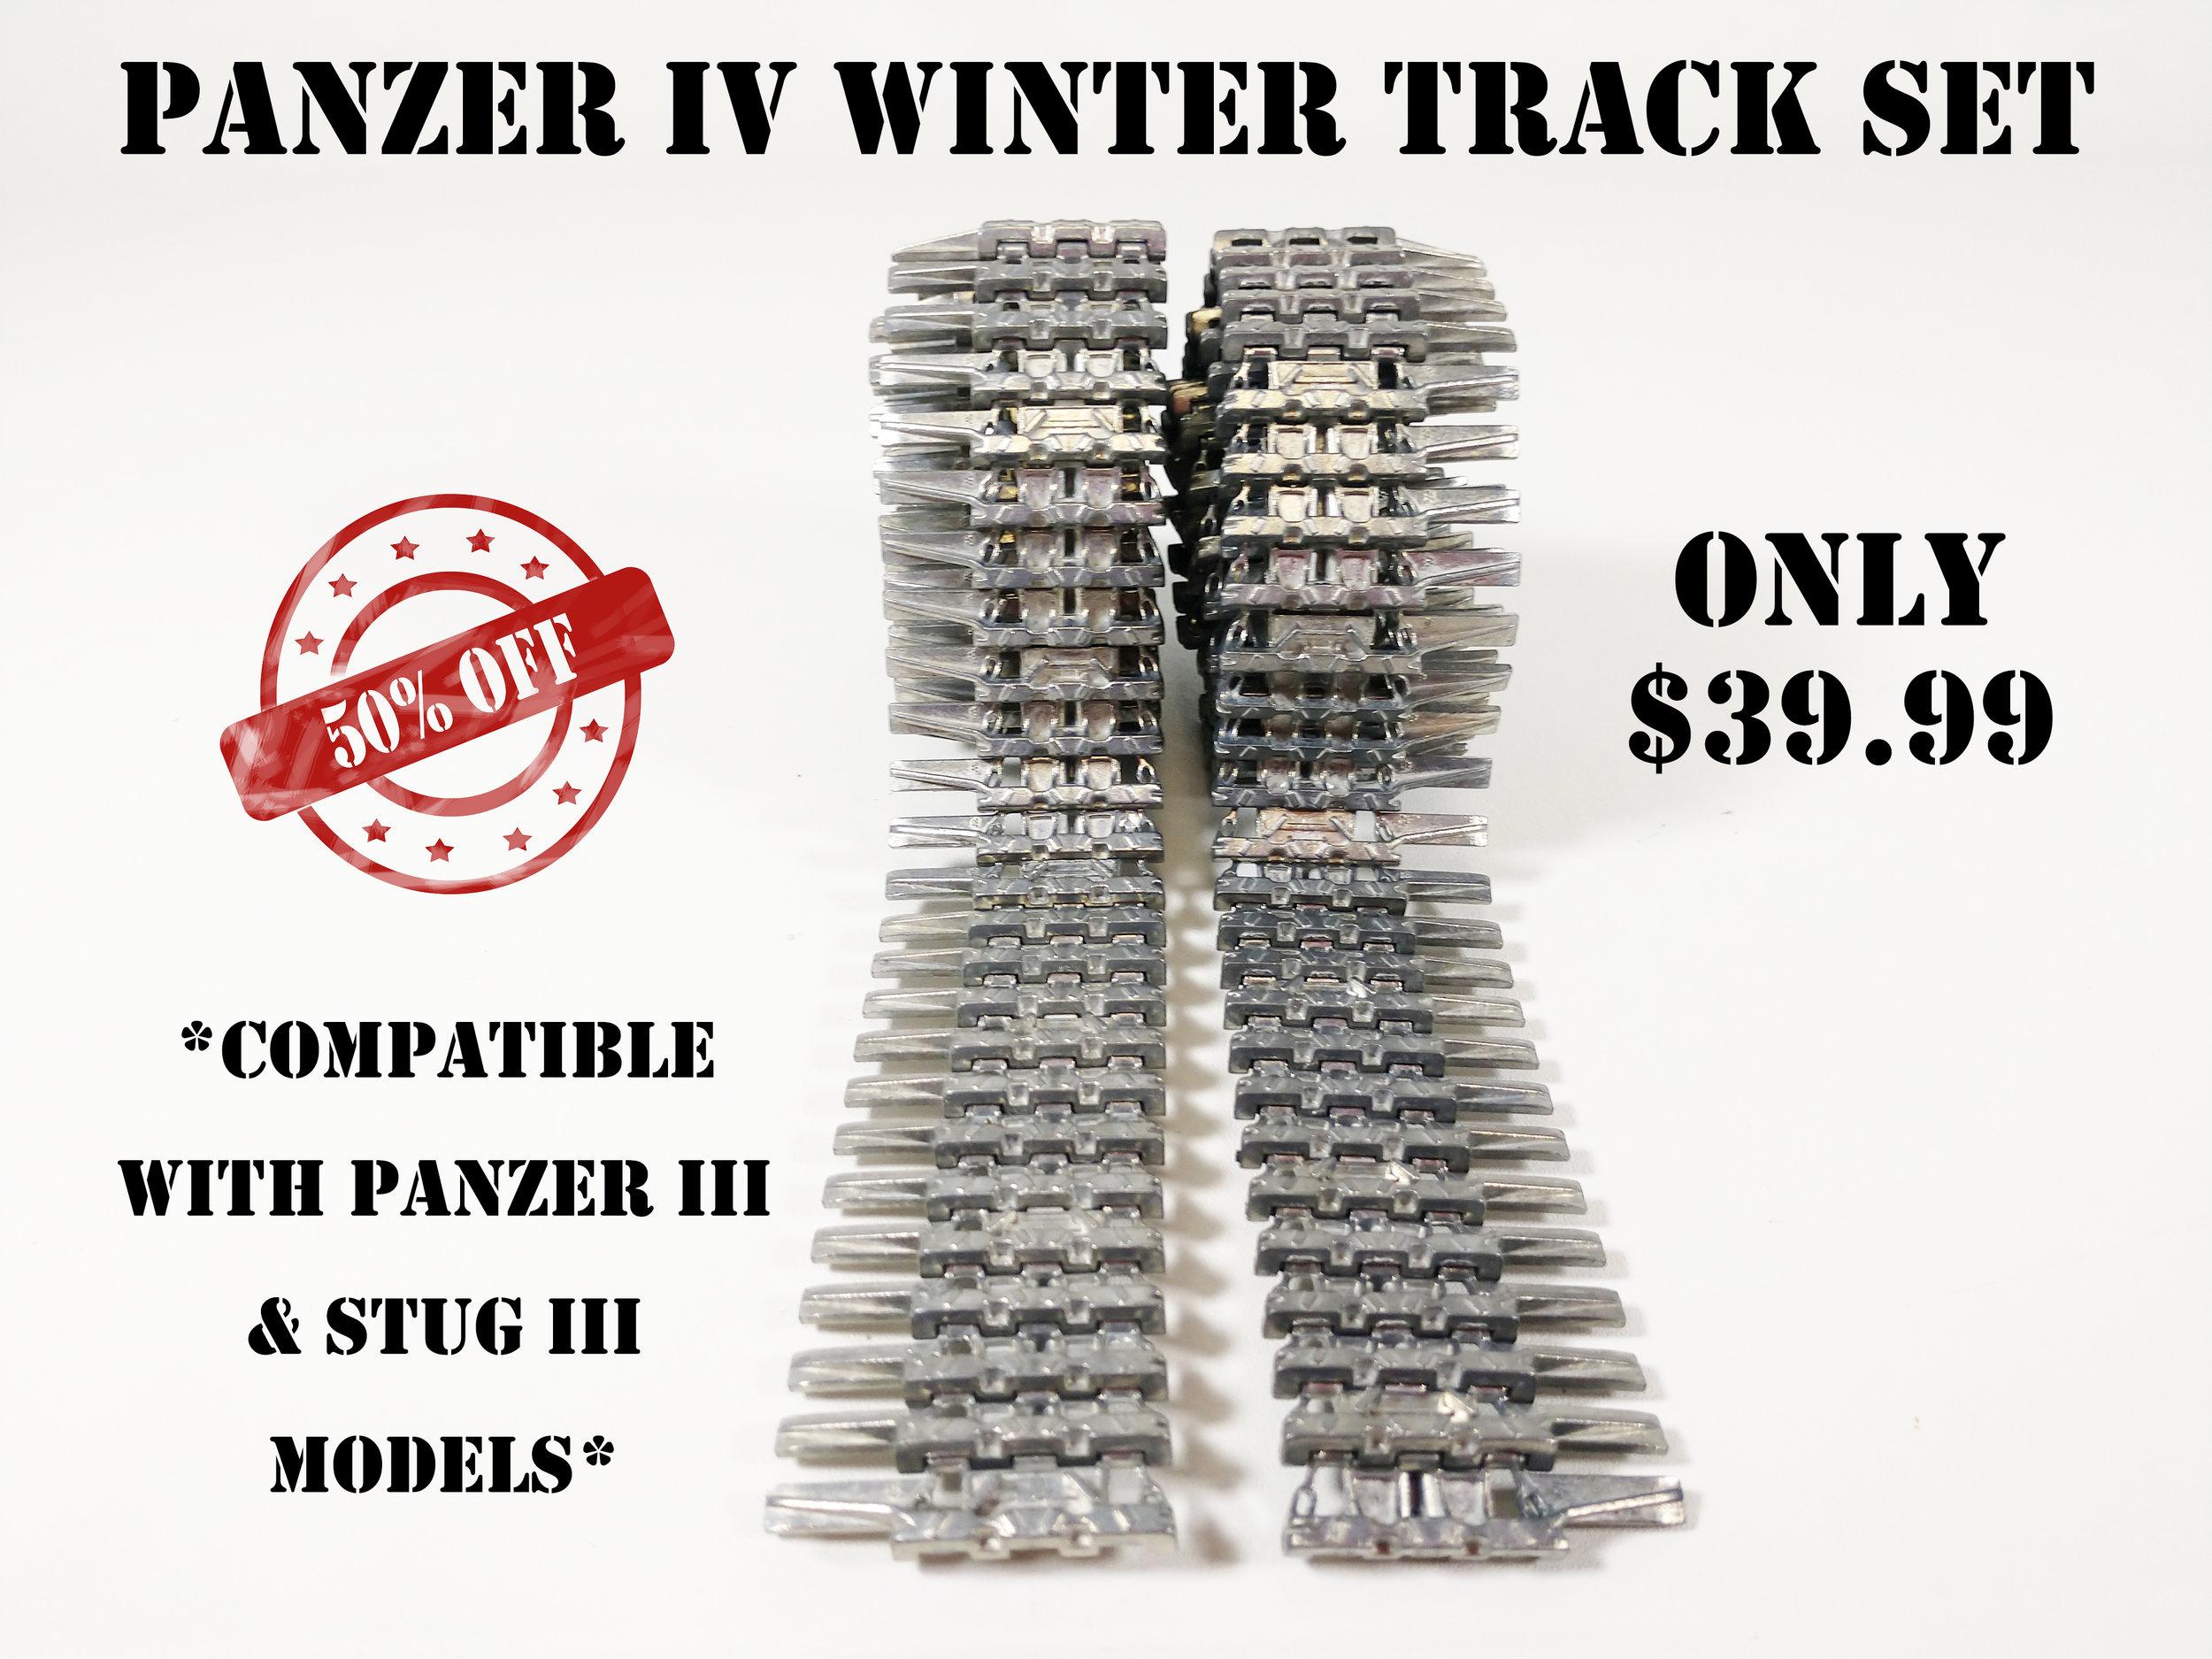 p4 winter track deal.jpg